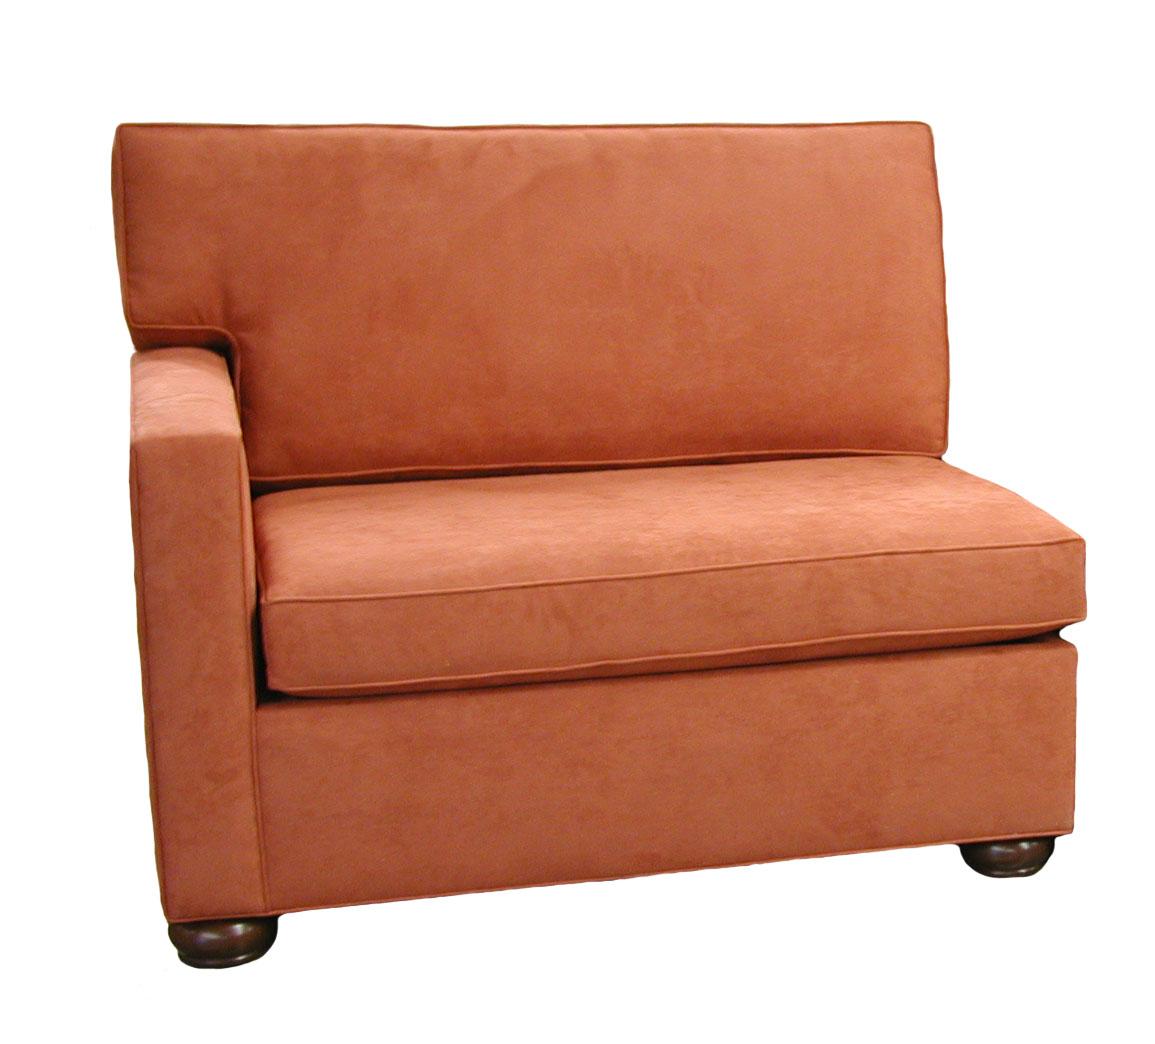 crawford sectional single sleeper sofa left facing. Black Bedroom Furniture Sets. Home Design Ideas